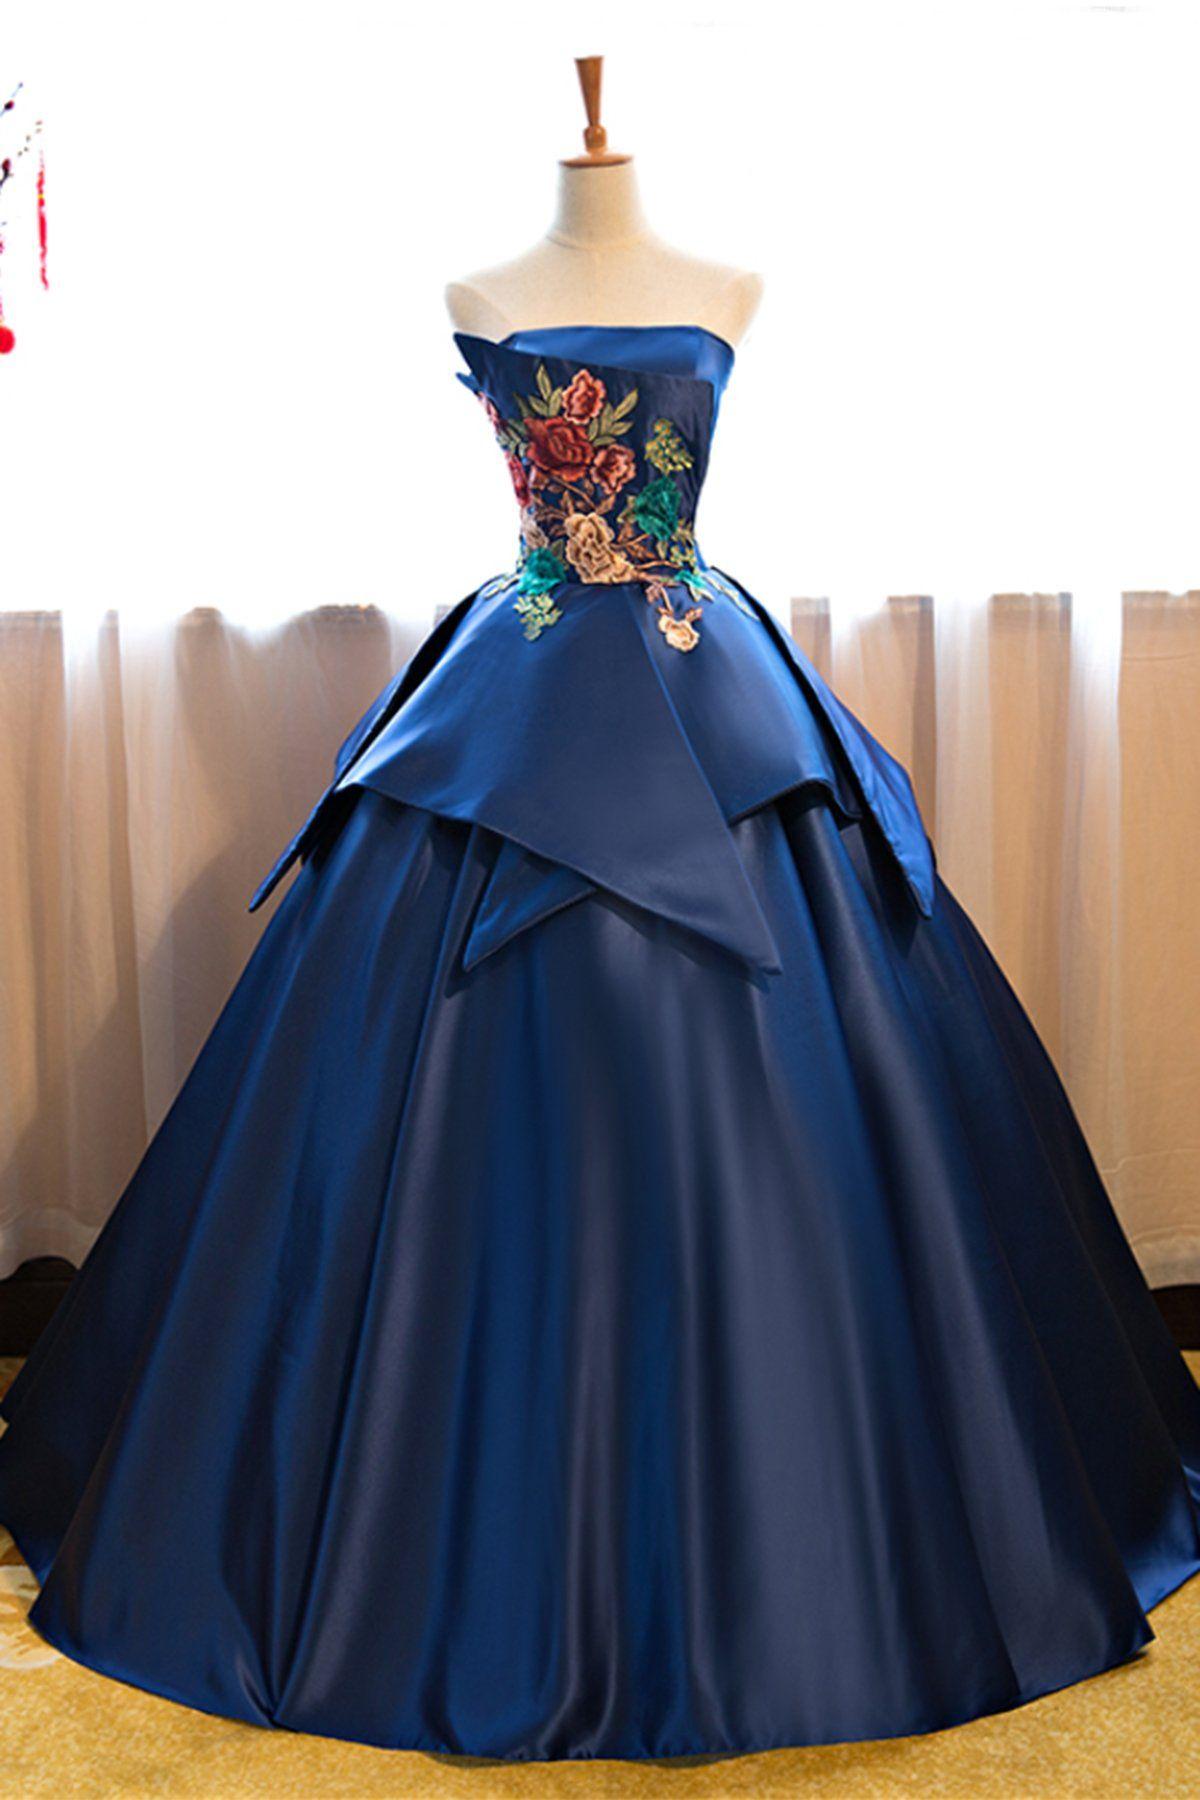 Prom dressesnew fashion prom dressesnavy blue strapless long